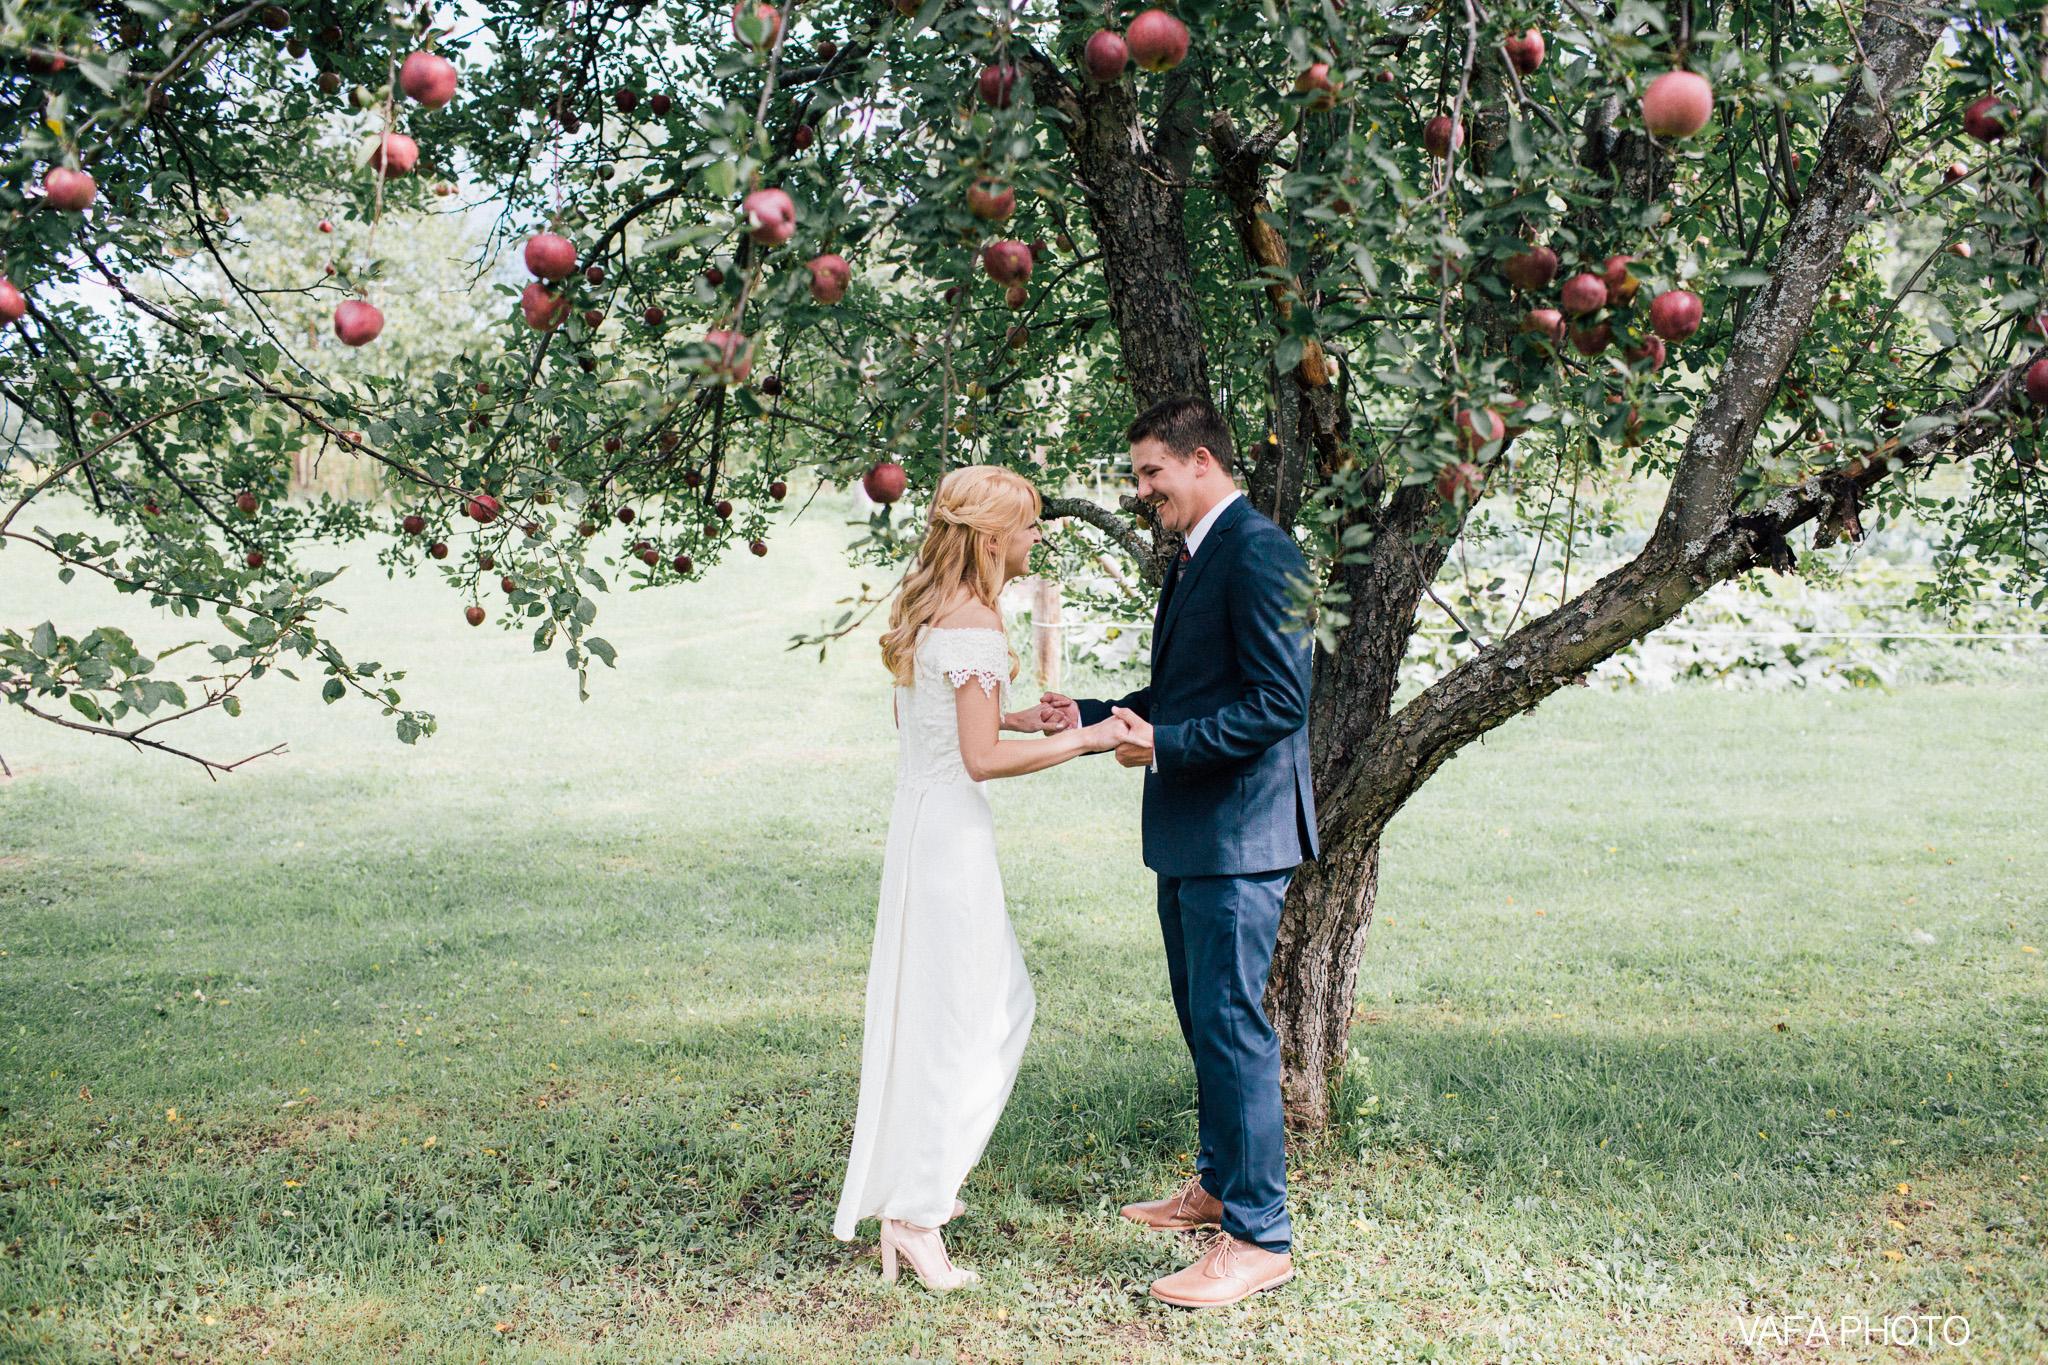 Belsolda-Farm-Wedding-Christy-Eric-Vafa-Photo-43.jpg